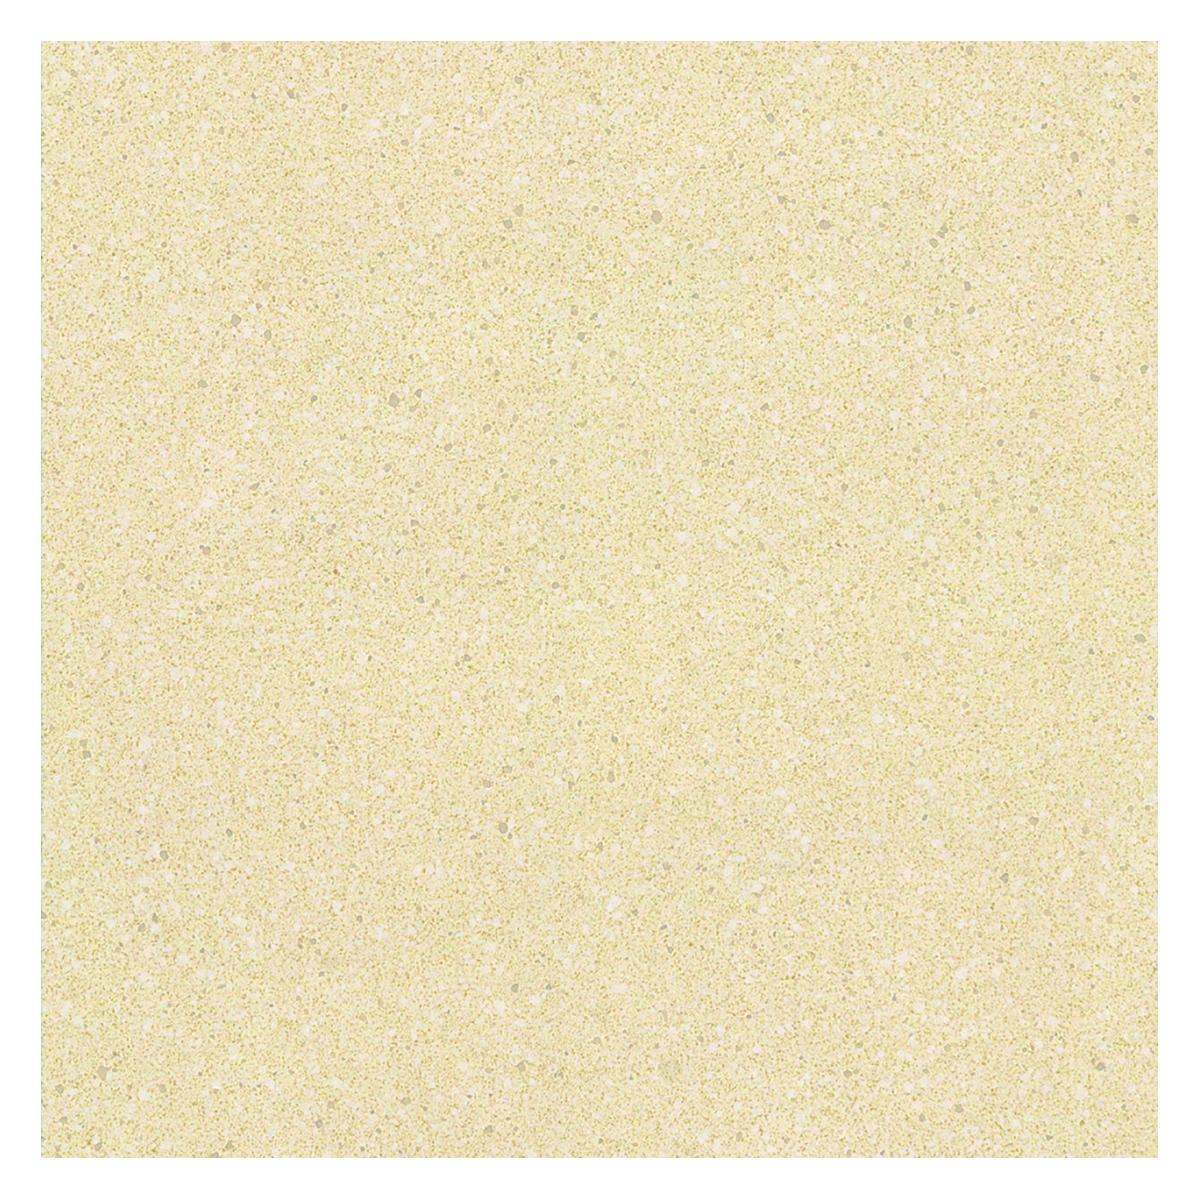 Porcelanato Spot Beige Brillante - 60X60 cm - 1.44 m2